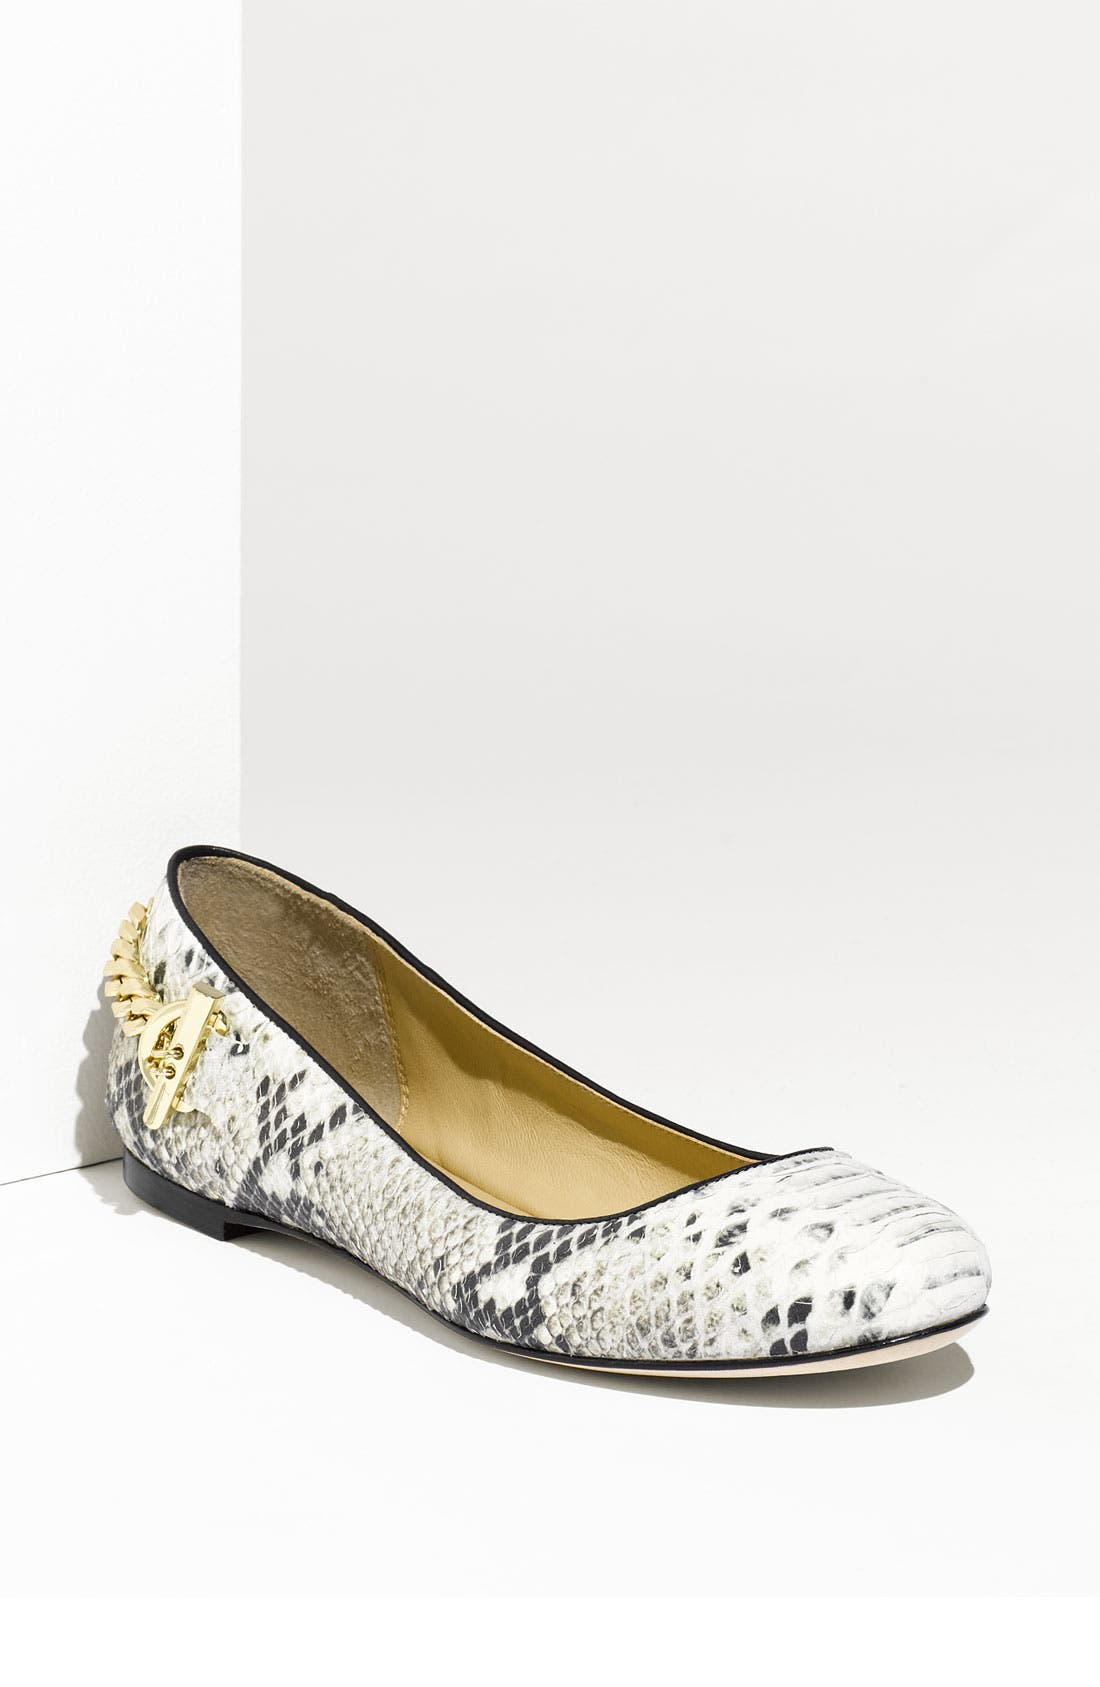 Alternate Image 1 Selected - Rachel Zoe 'Laura' Genuine Snakeskin Flat